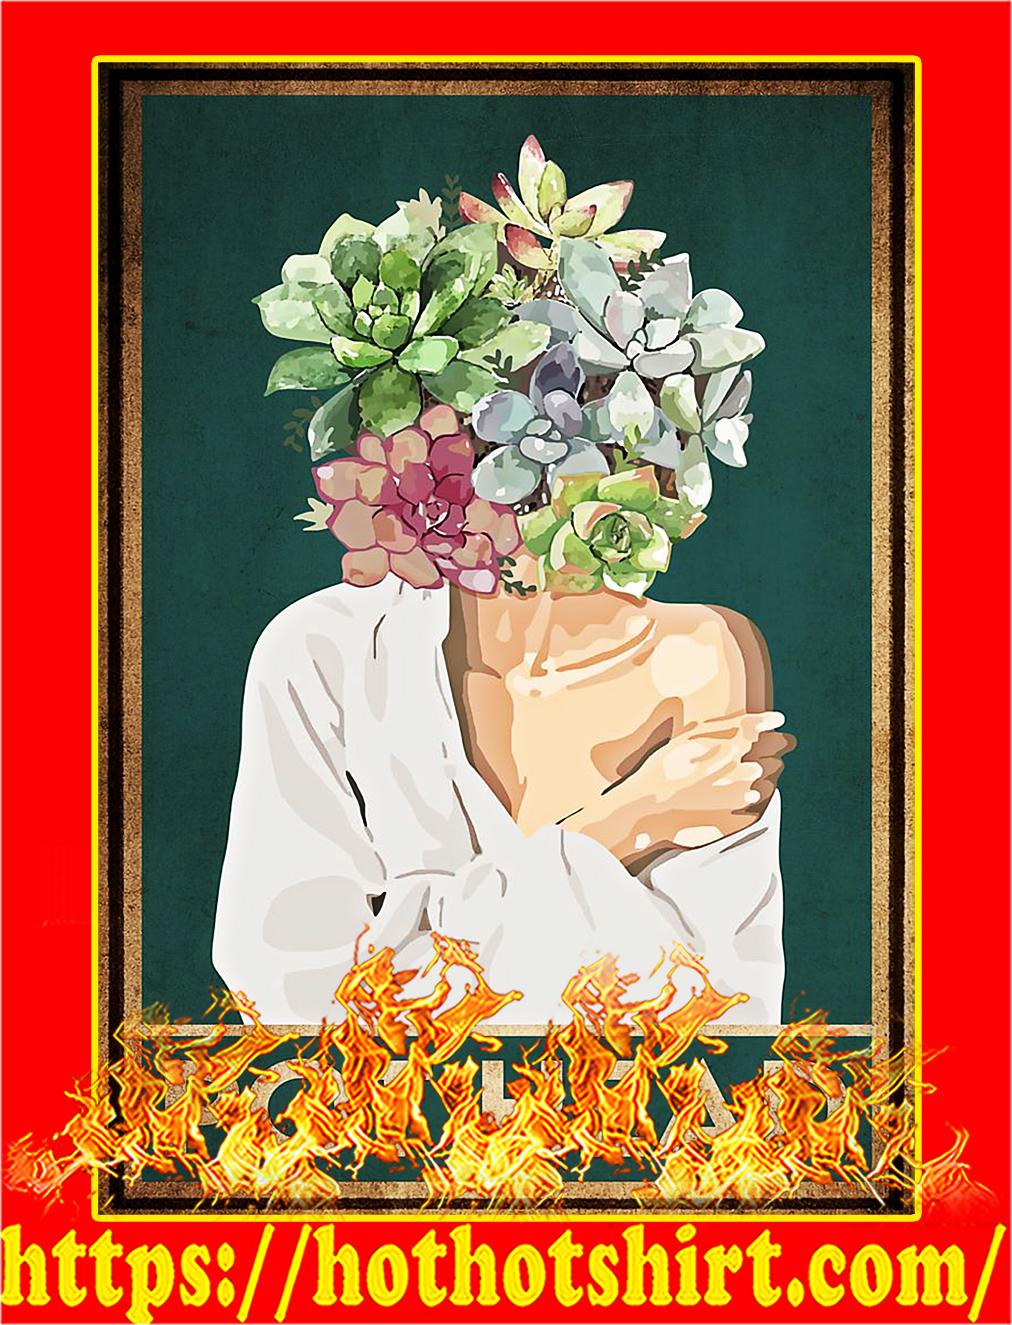 Pot head garden poster - A4